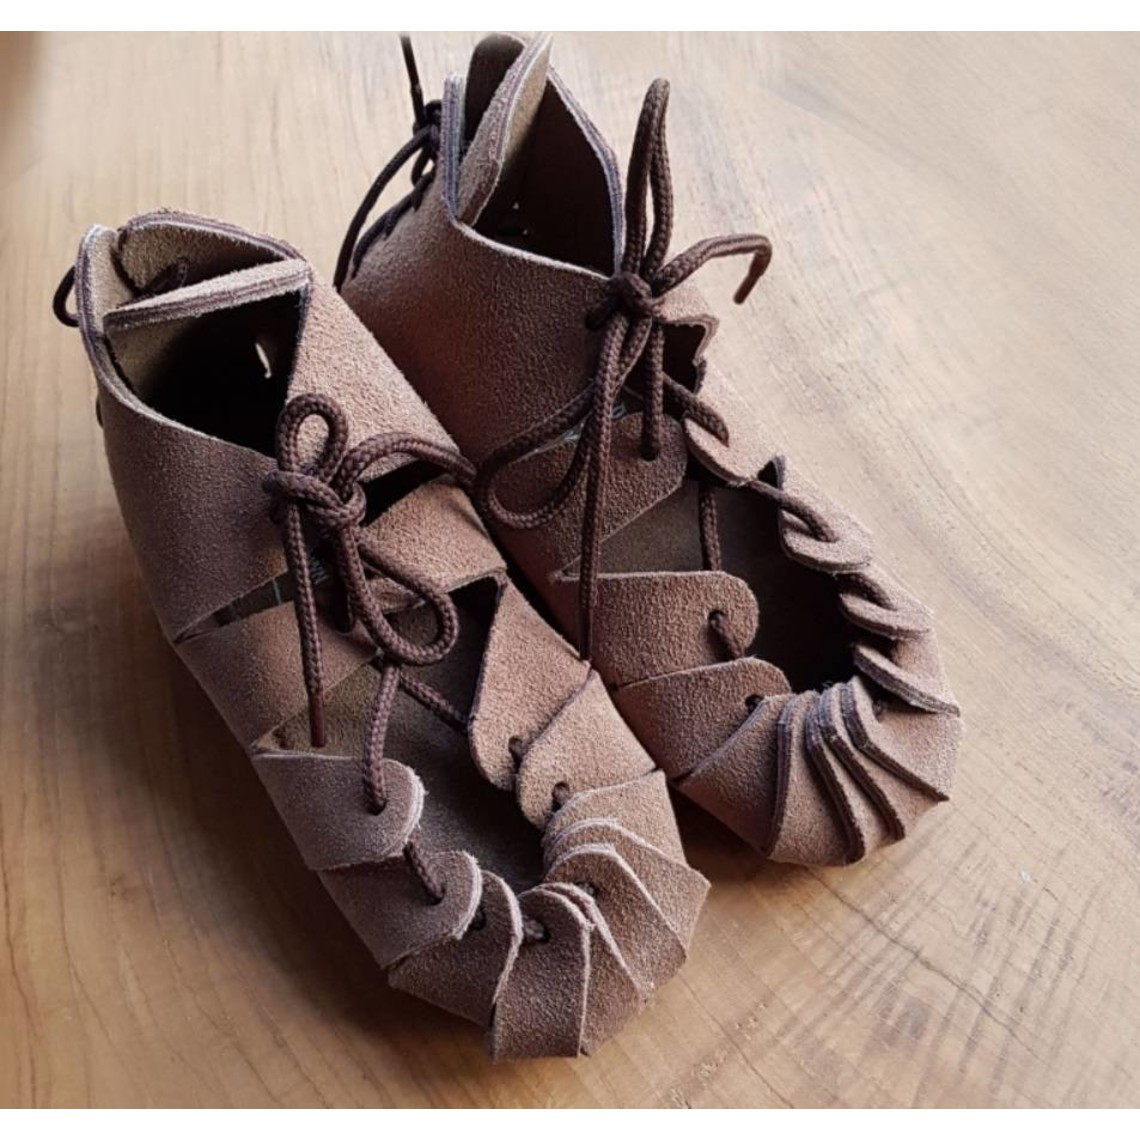 Leonardo Carbone Iron Age sandalias para niños talla 31, ¡oferta especial!